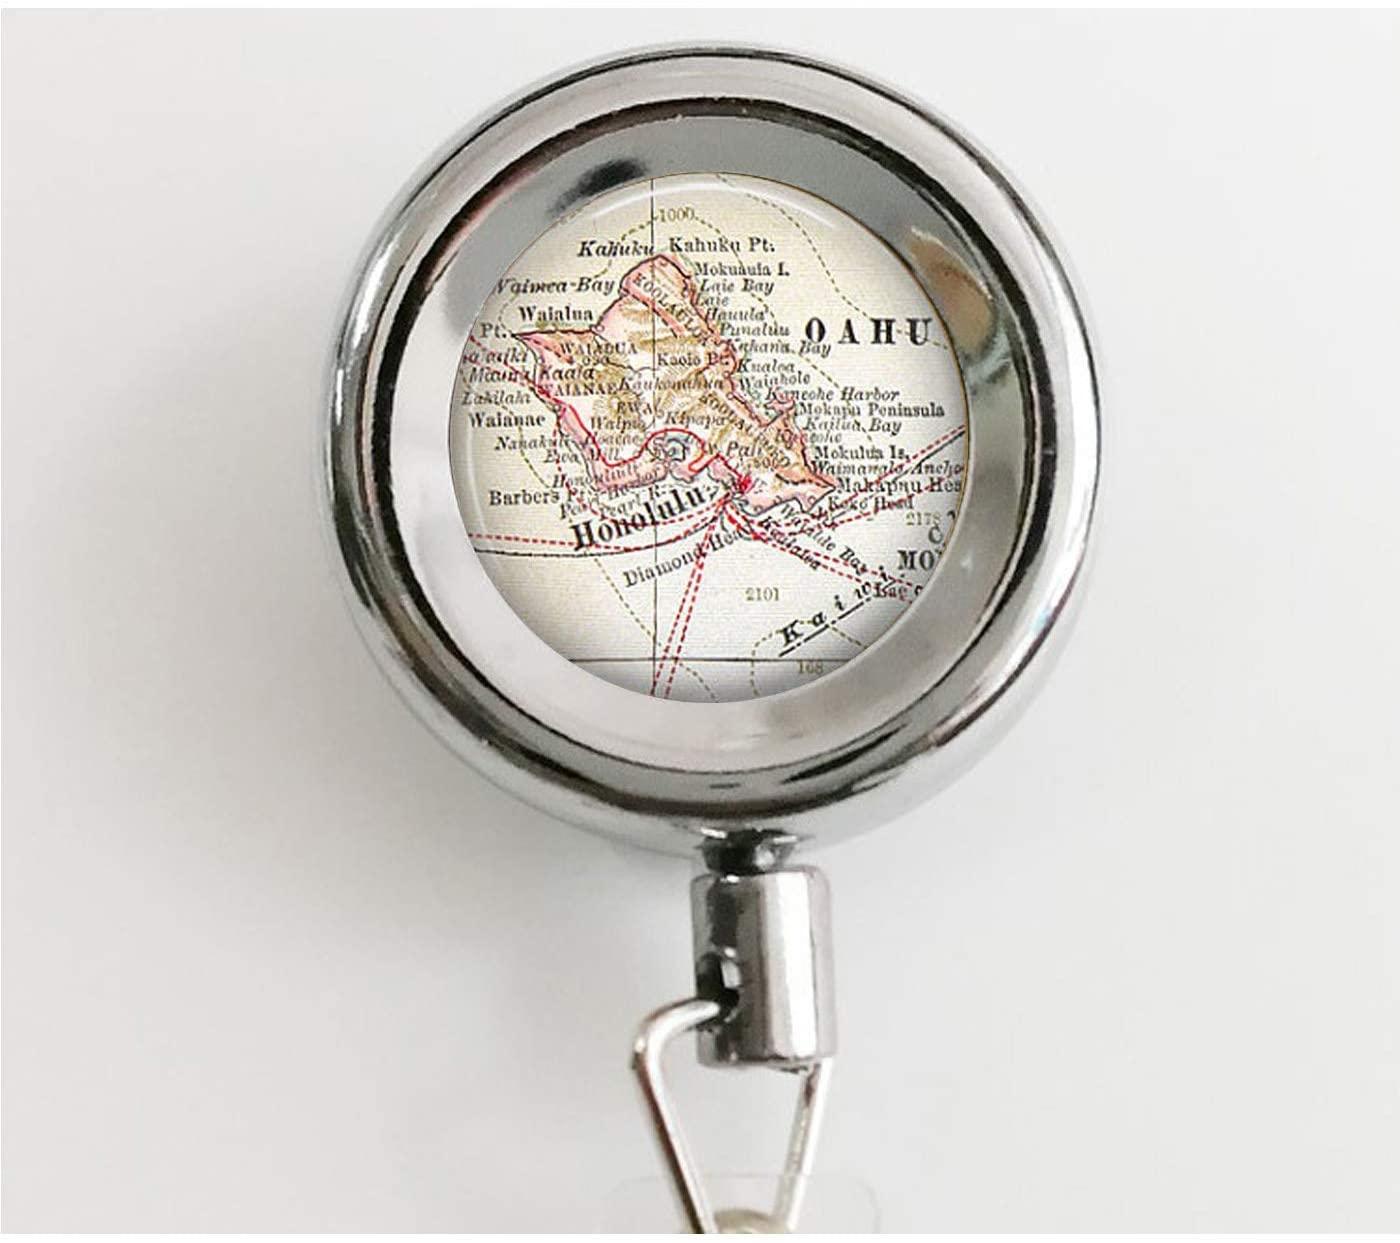 Oahu, Hawaii Vintage Map Jewelry - Keychain - Compass Charm - Hawaiian Islands Retractable Badge Reel with Waterproof ID Holders & Keychain